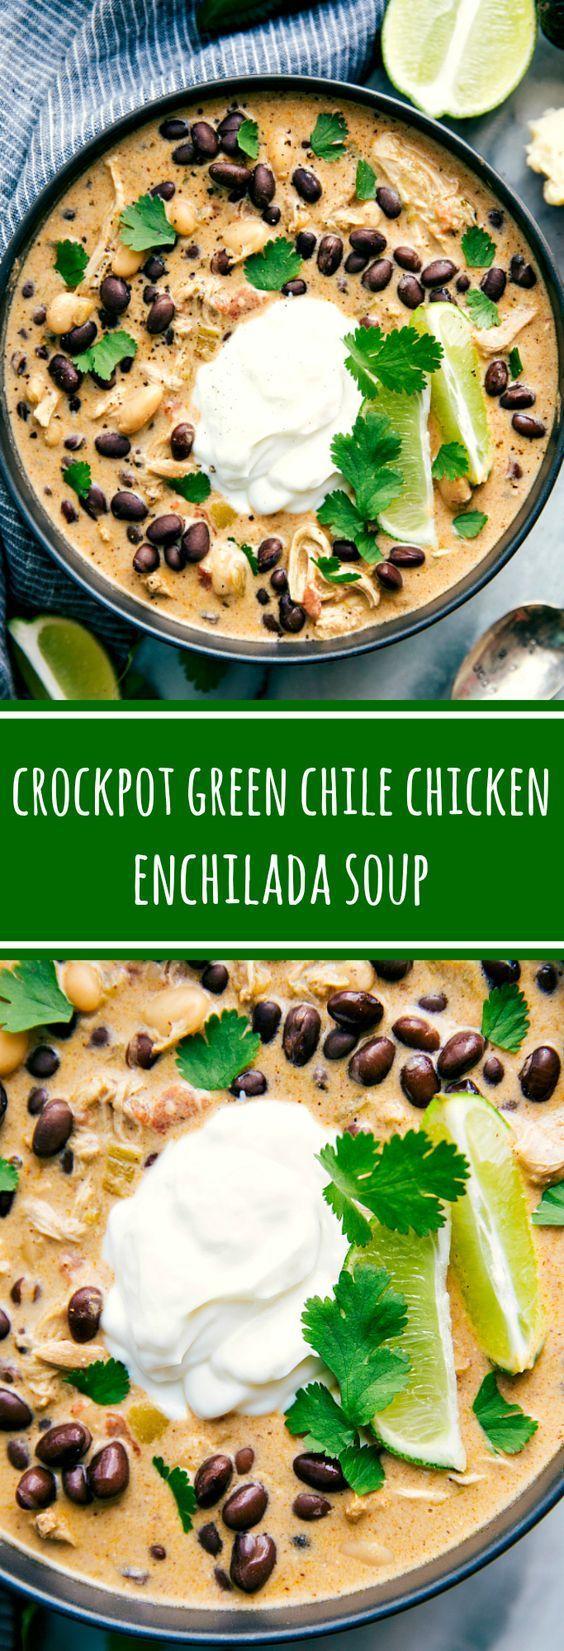 Crockpot Green Chicken Chile Enchilada Soup